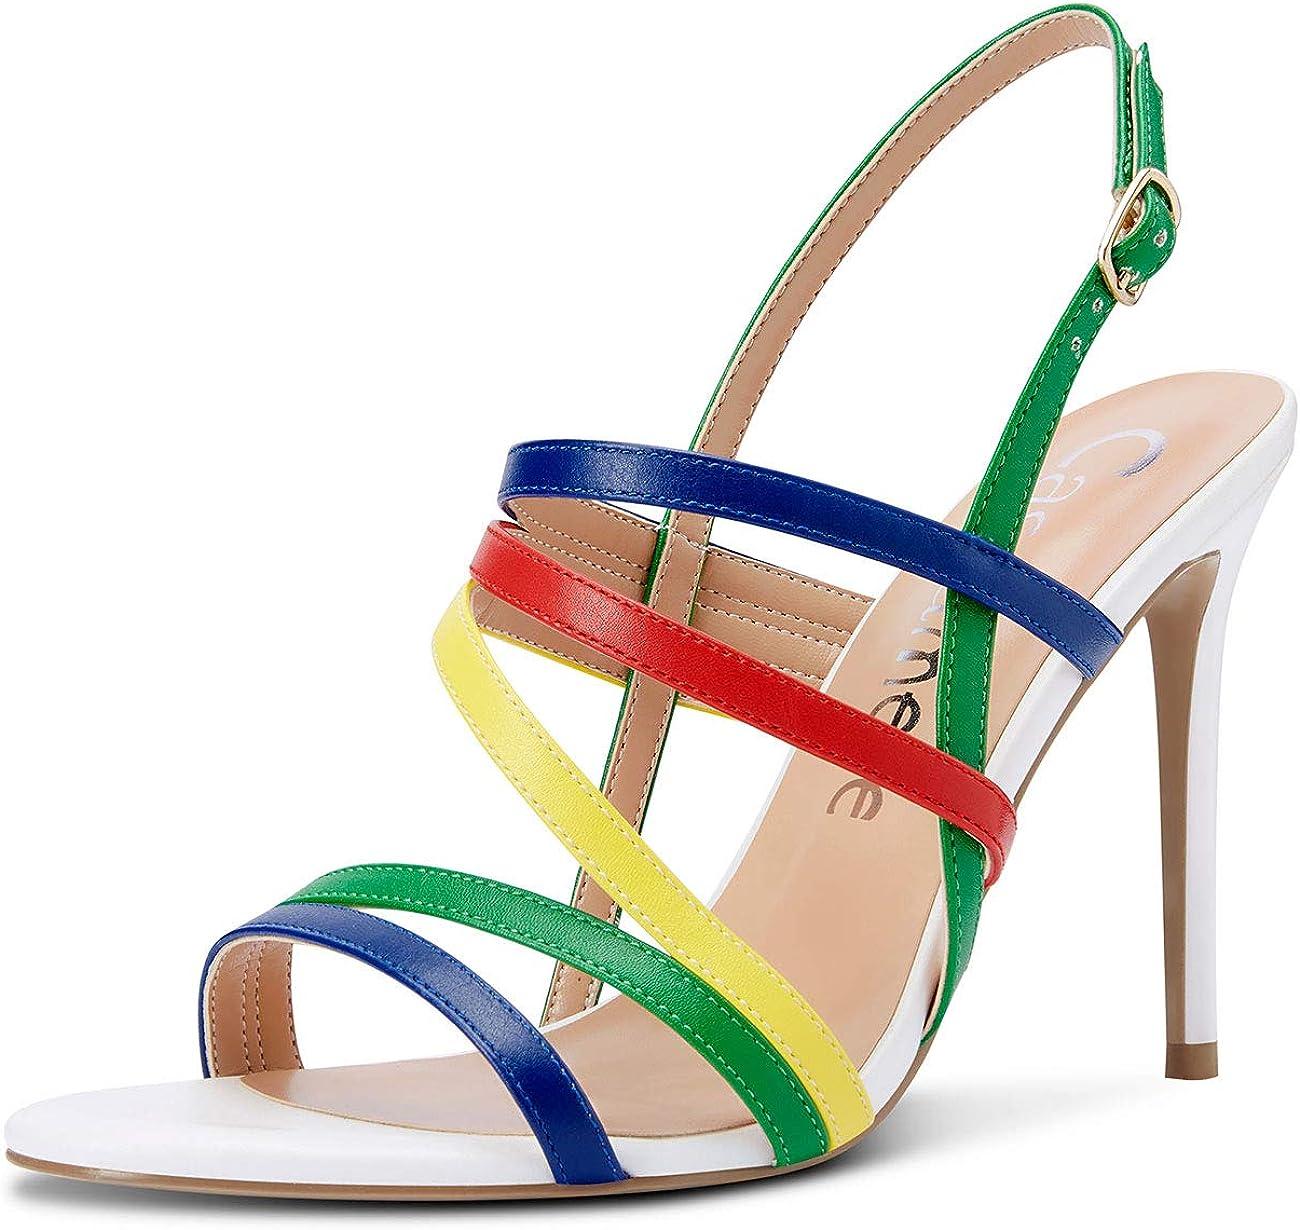 CASTAMERE Women High Heels Superlatite Roman Thin Stiletto Fixed price for sale Slingback Sandals